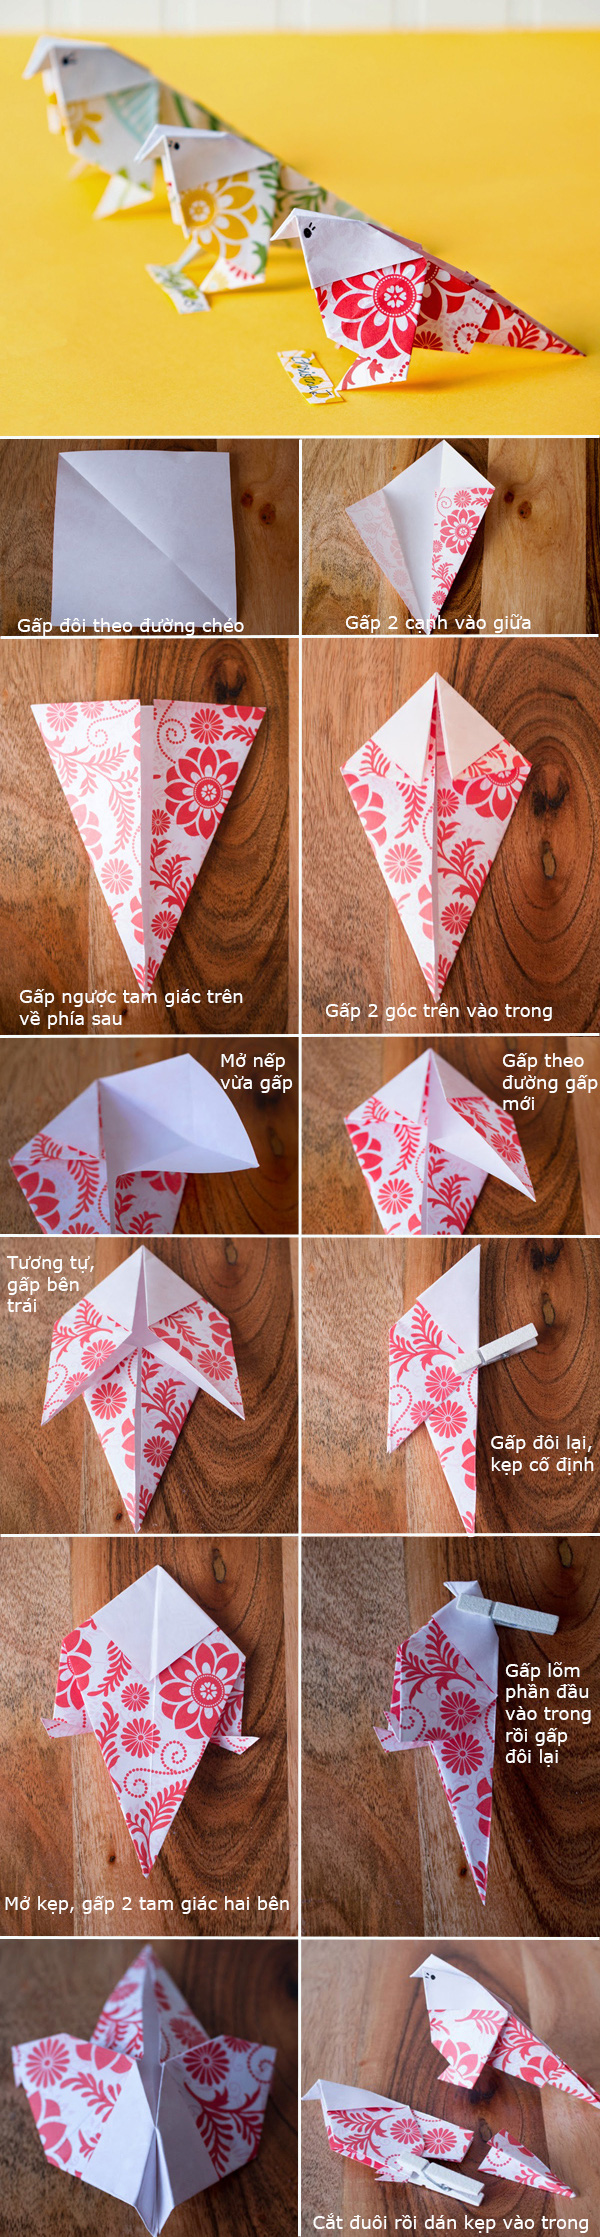 gap giay nhat ban origami